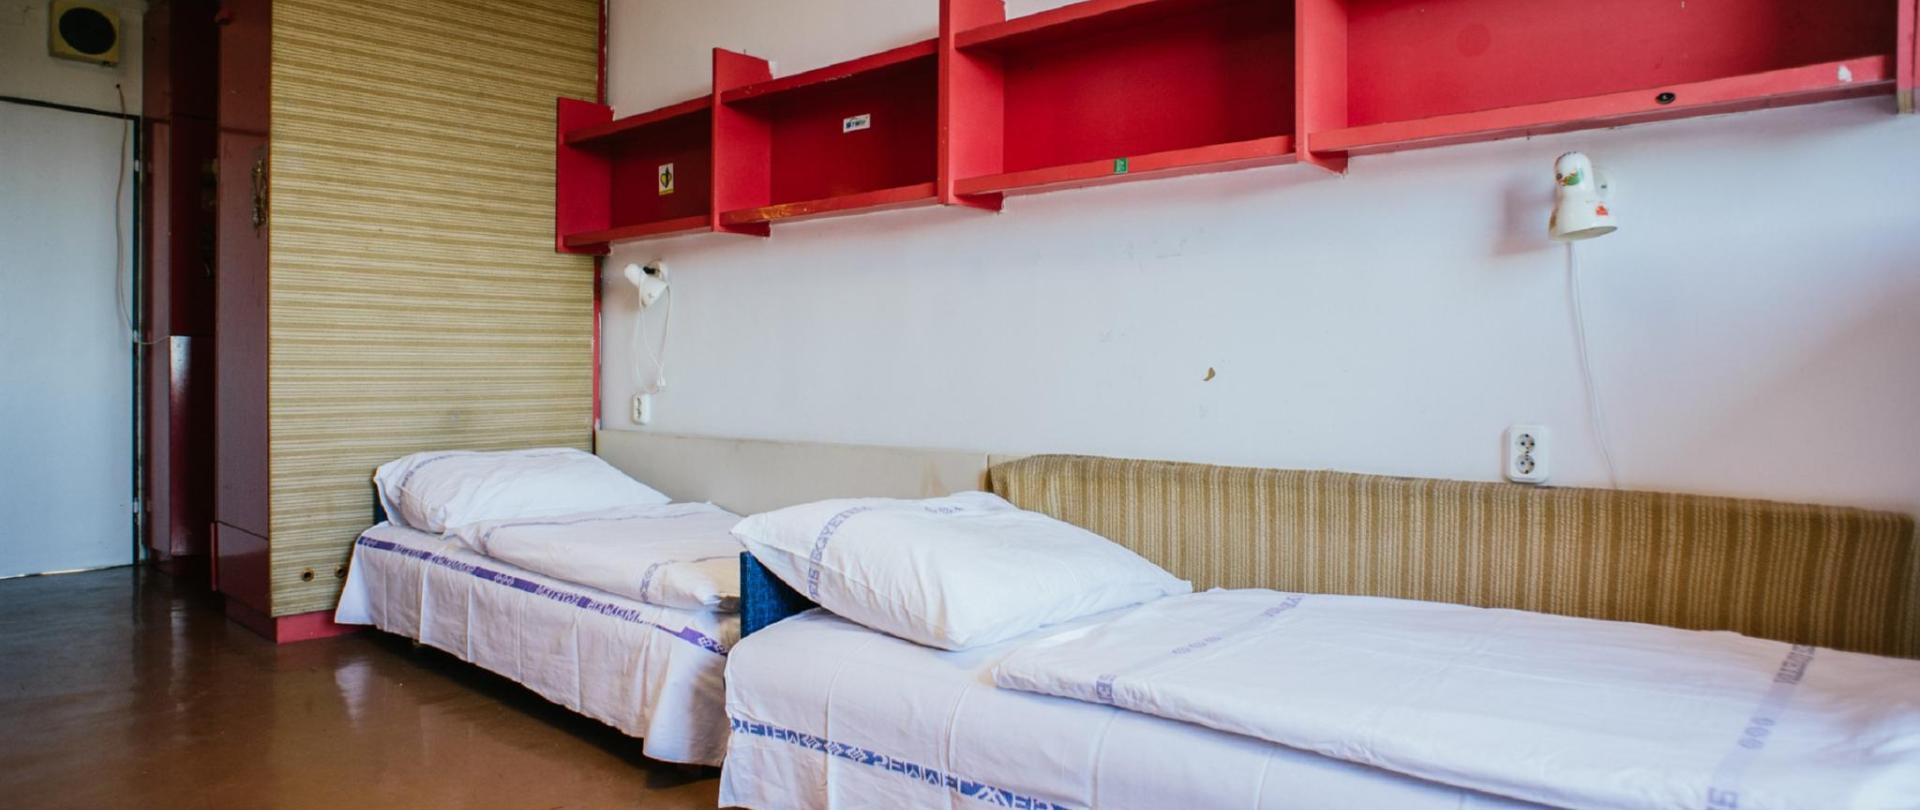 City Hostel Pest 35.